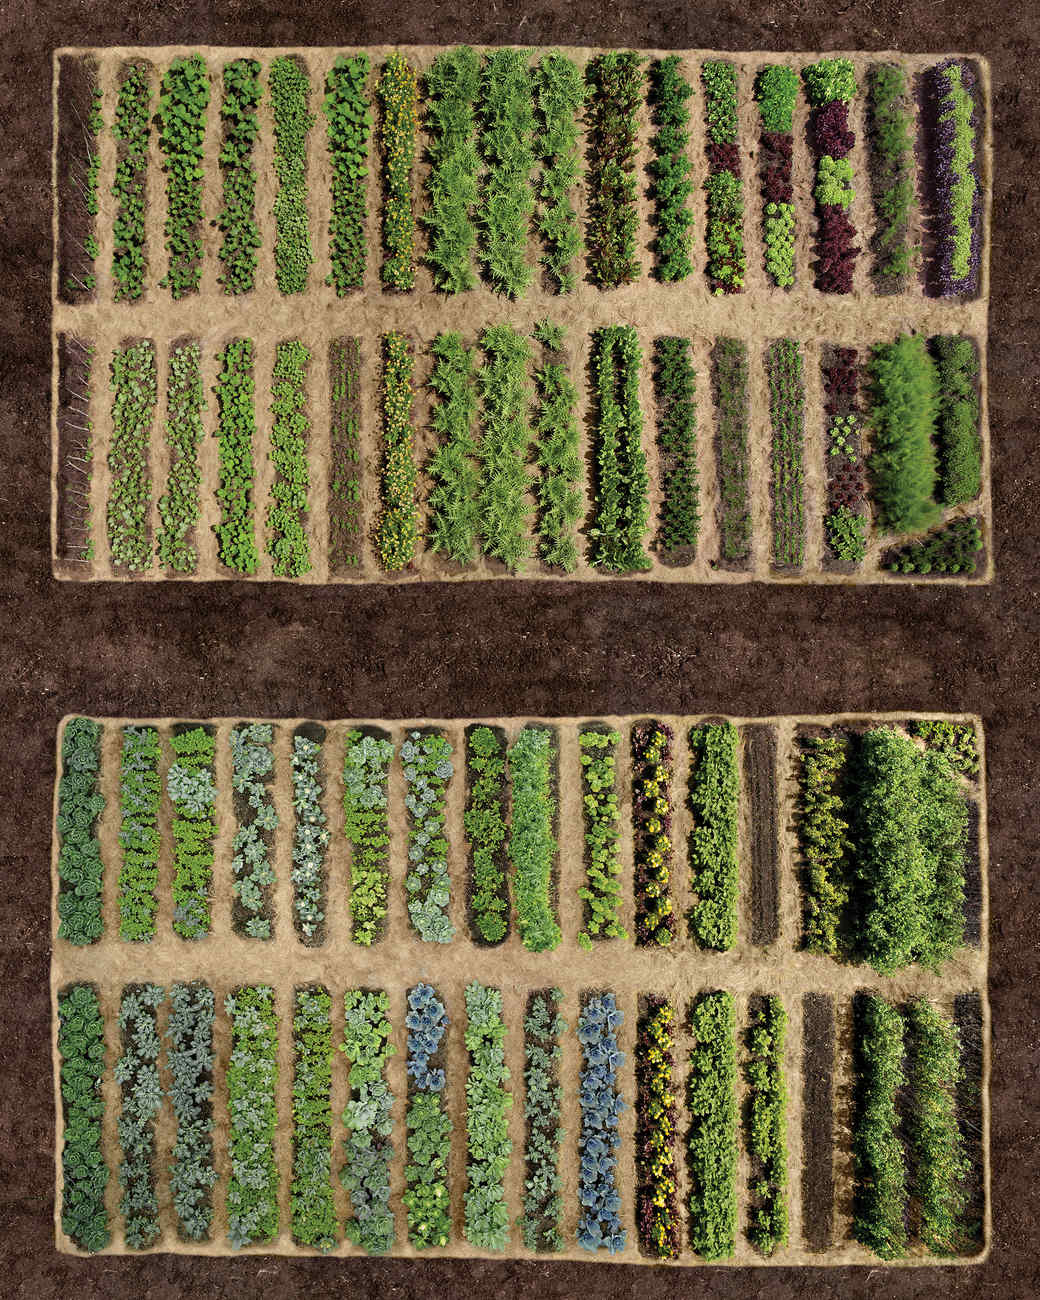 Great Vegetable Garden Ideas Part - 49: Planning Your Garden